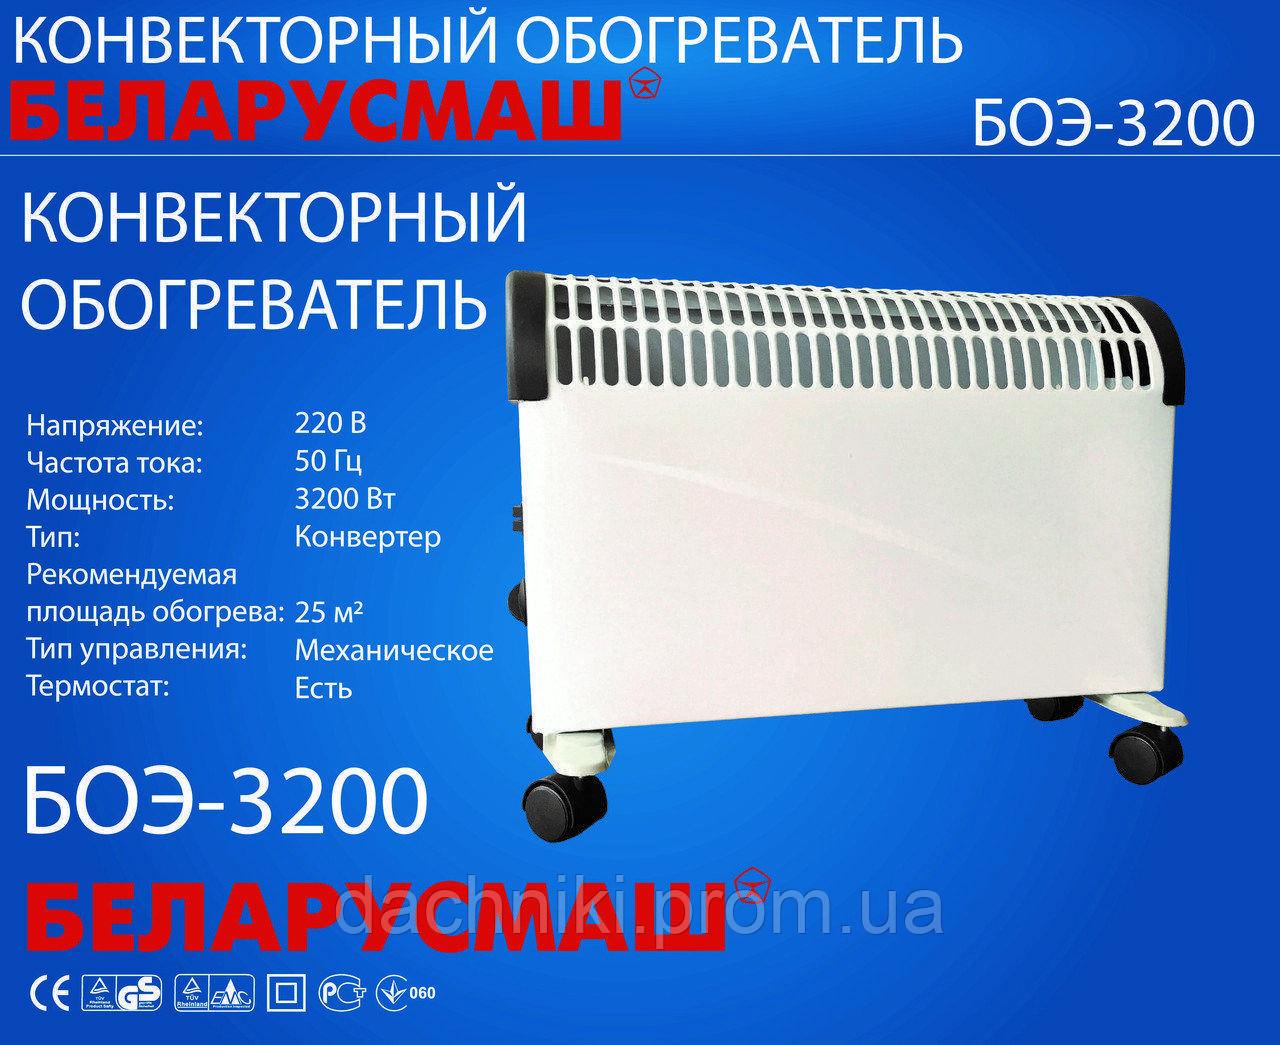 Беларусмаш БОЭ-3200 Конвектор обогреватель электрический